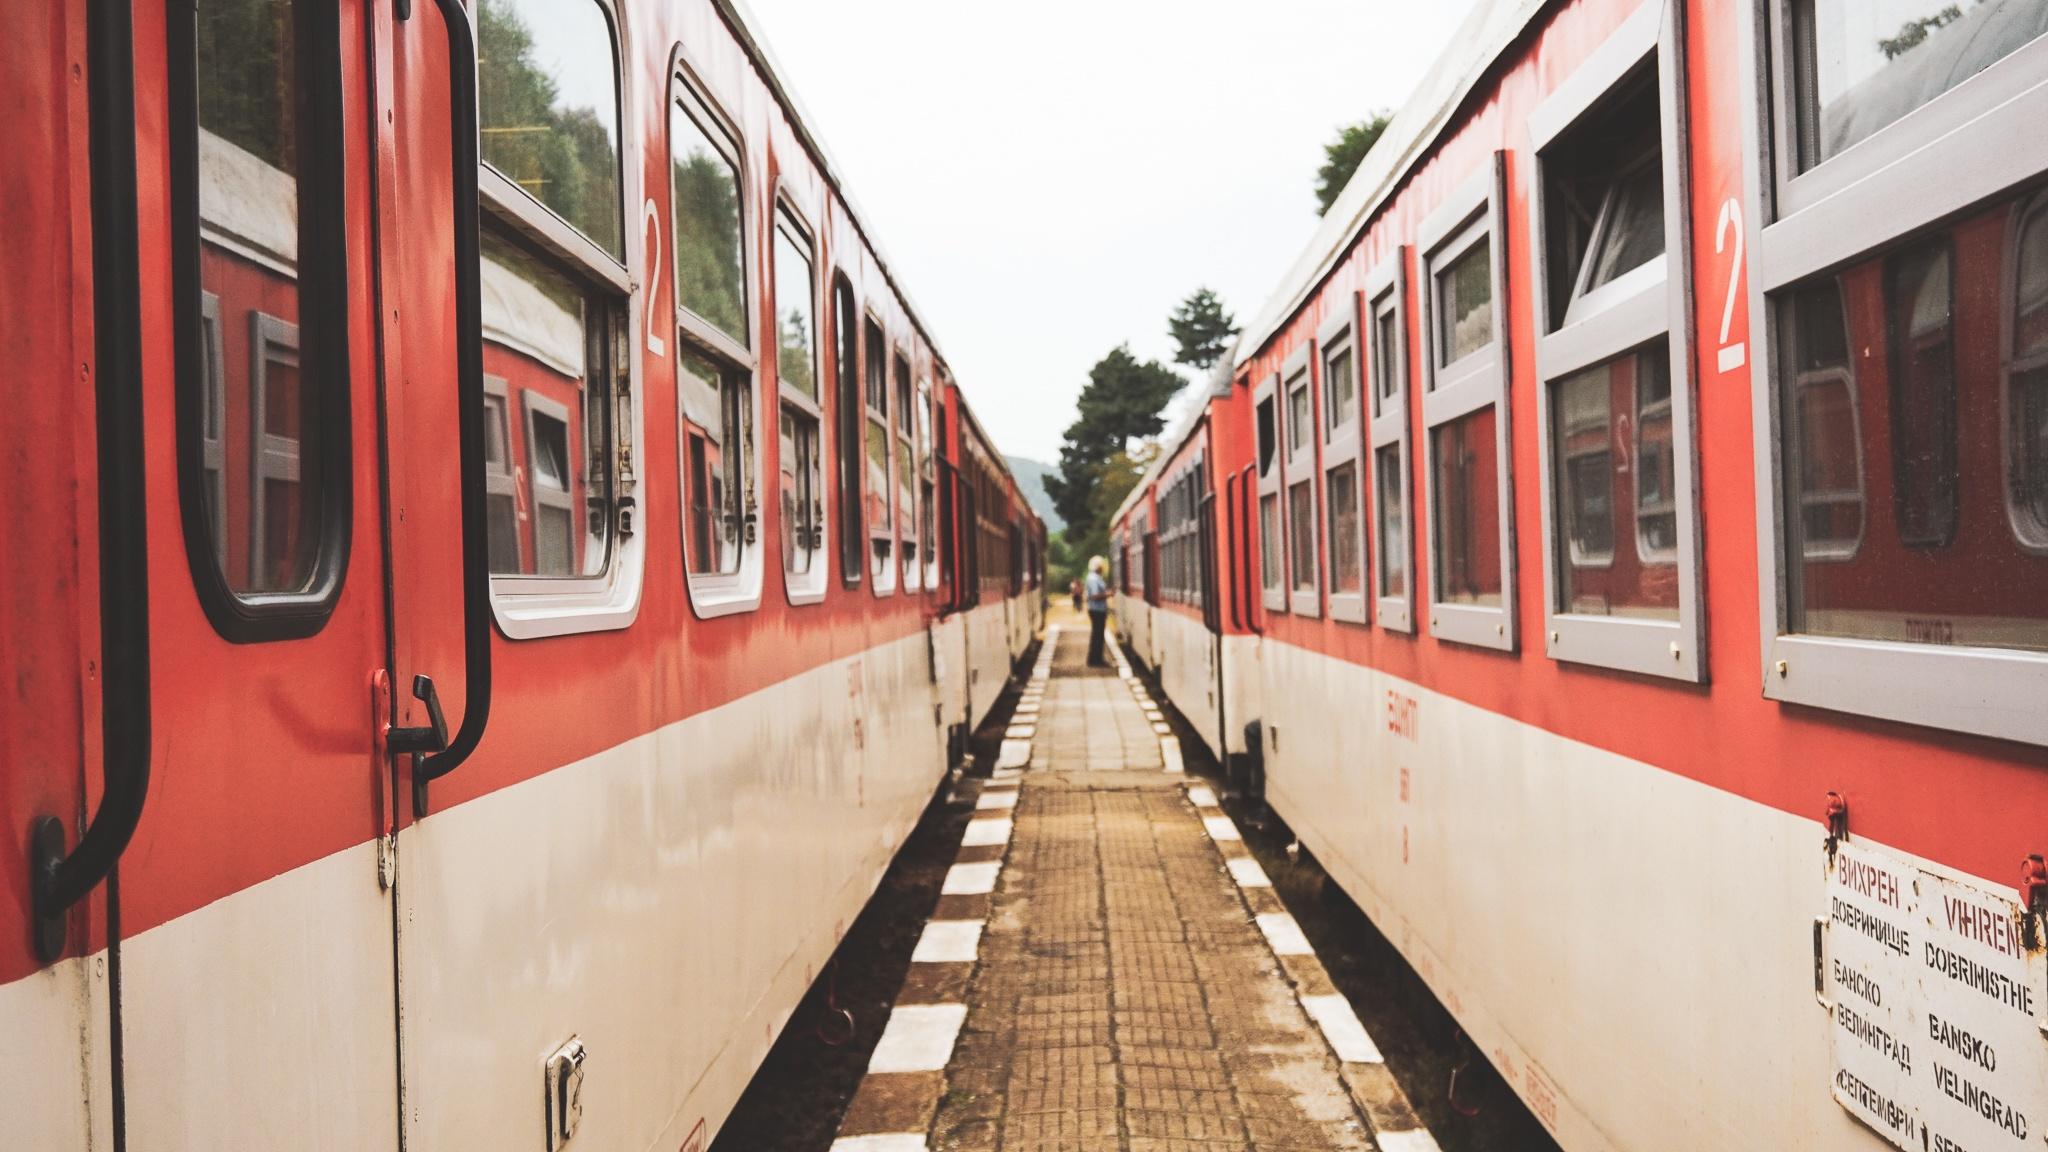 The Rhodope Narrow Gauge Train